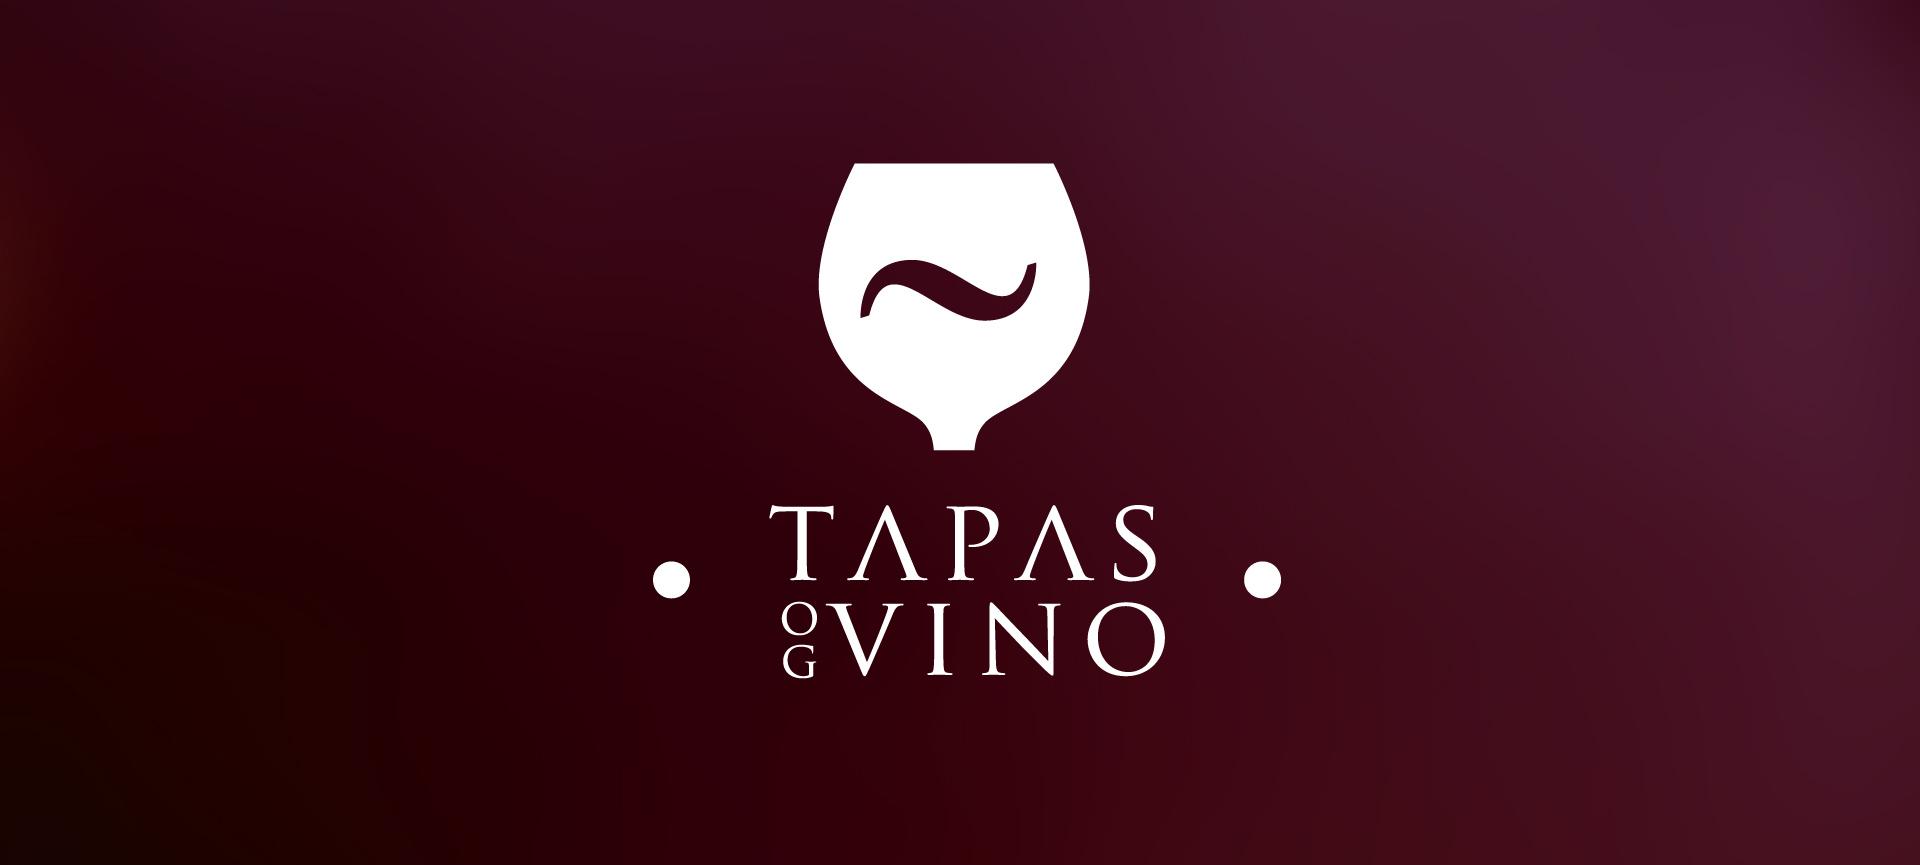 TapasOgVino-01